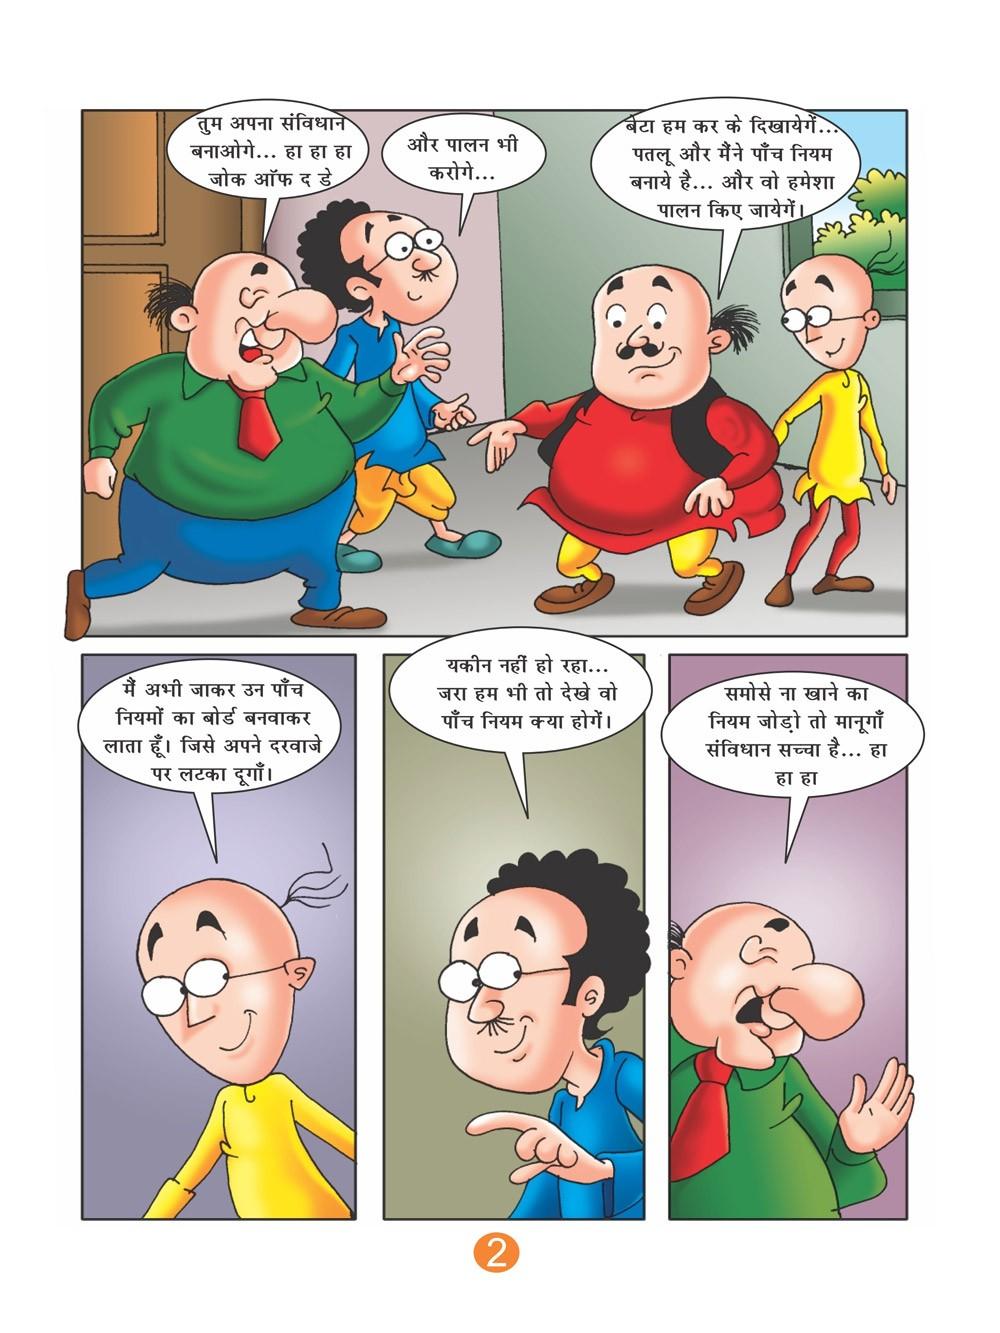 Lotpot Comics The Constitution of the Funny Comic Motu Patlu